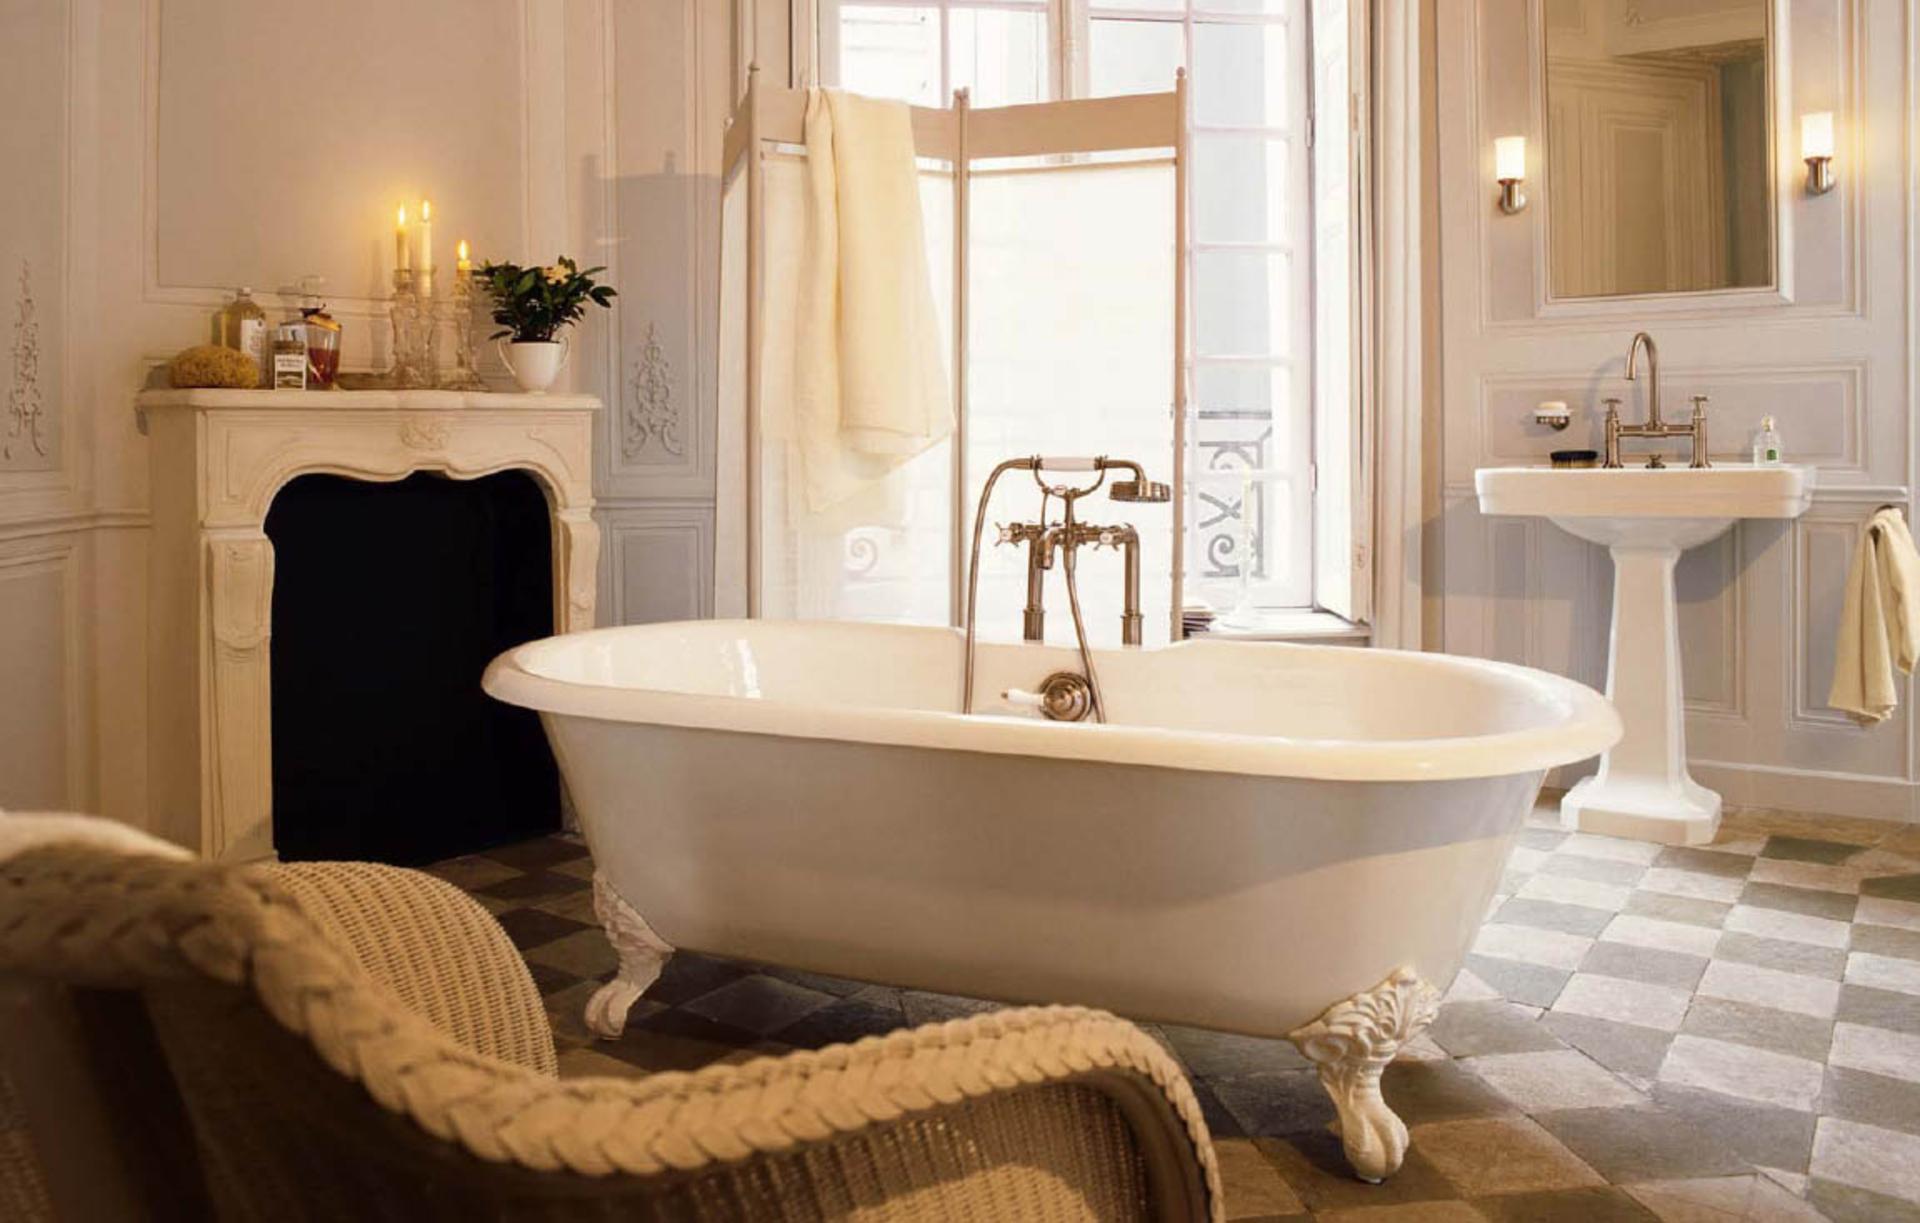 beige-tile-elements-bathroom-design-color-scheme